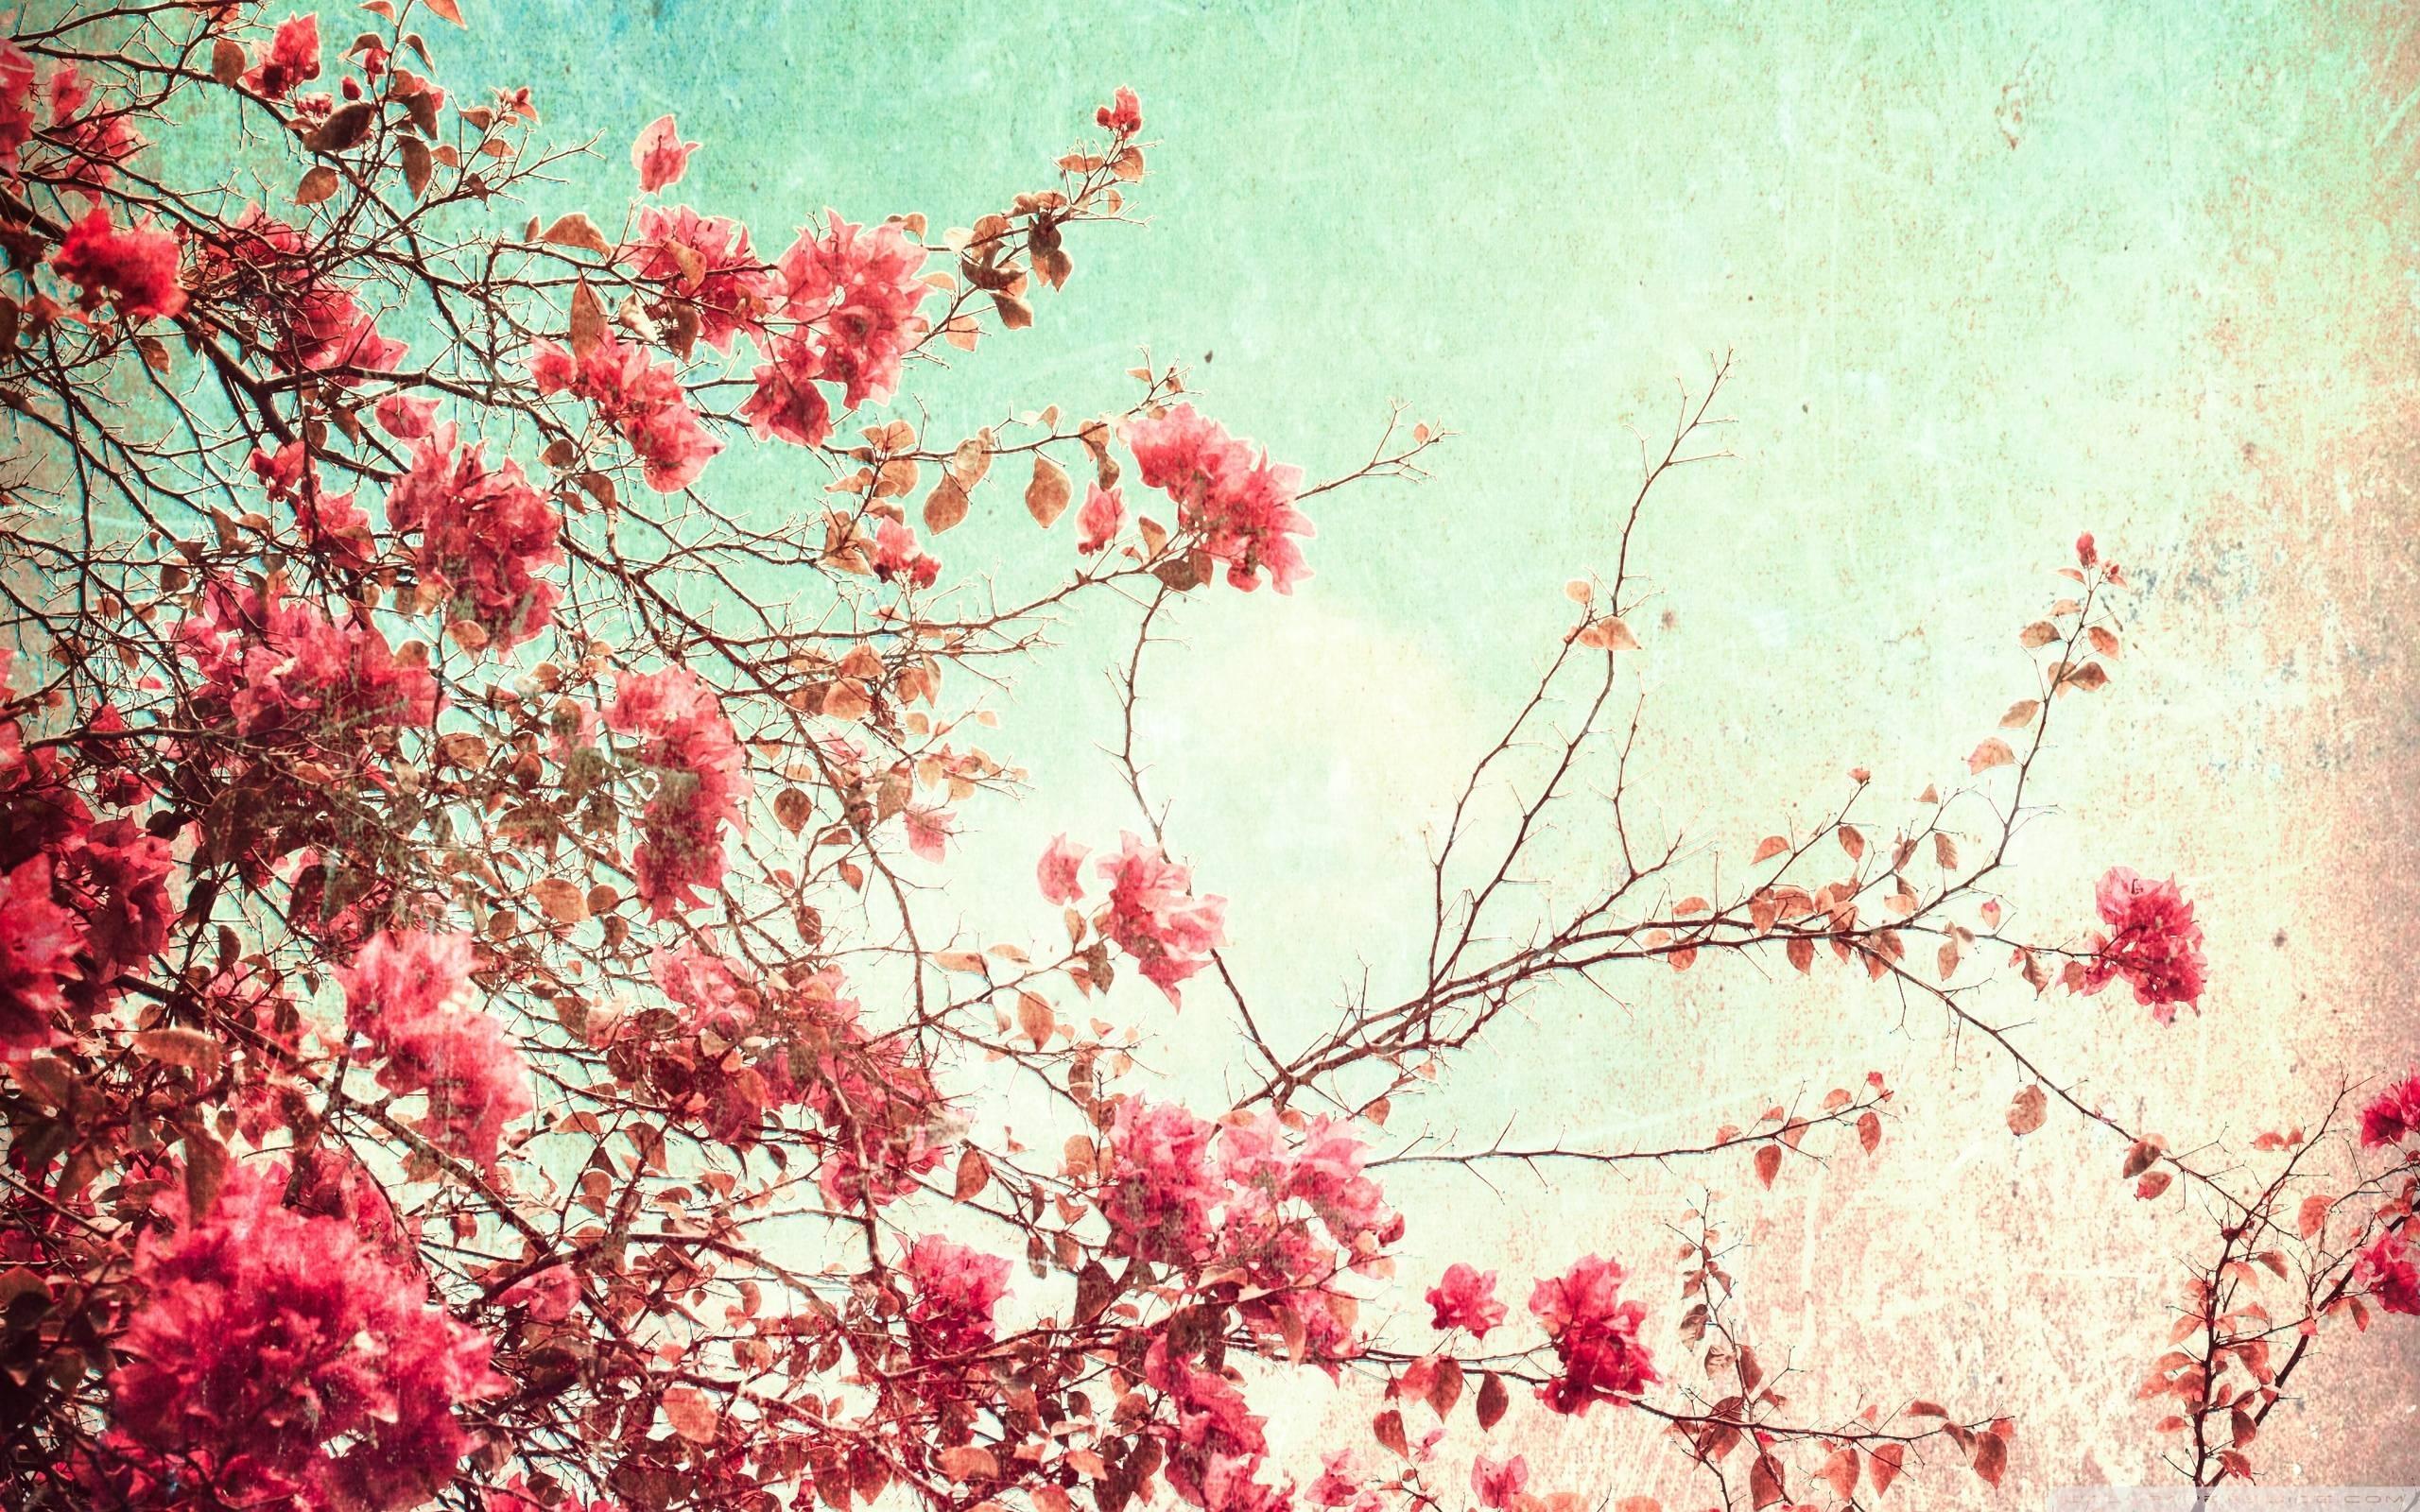 vintage flowers wallpapers - wallpaper cave